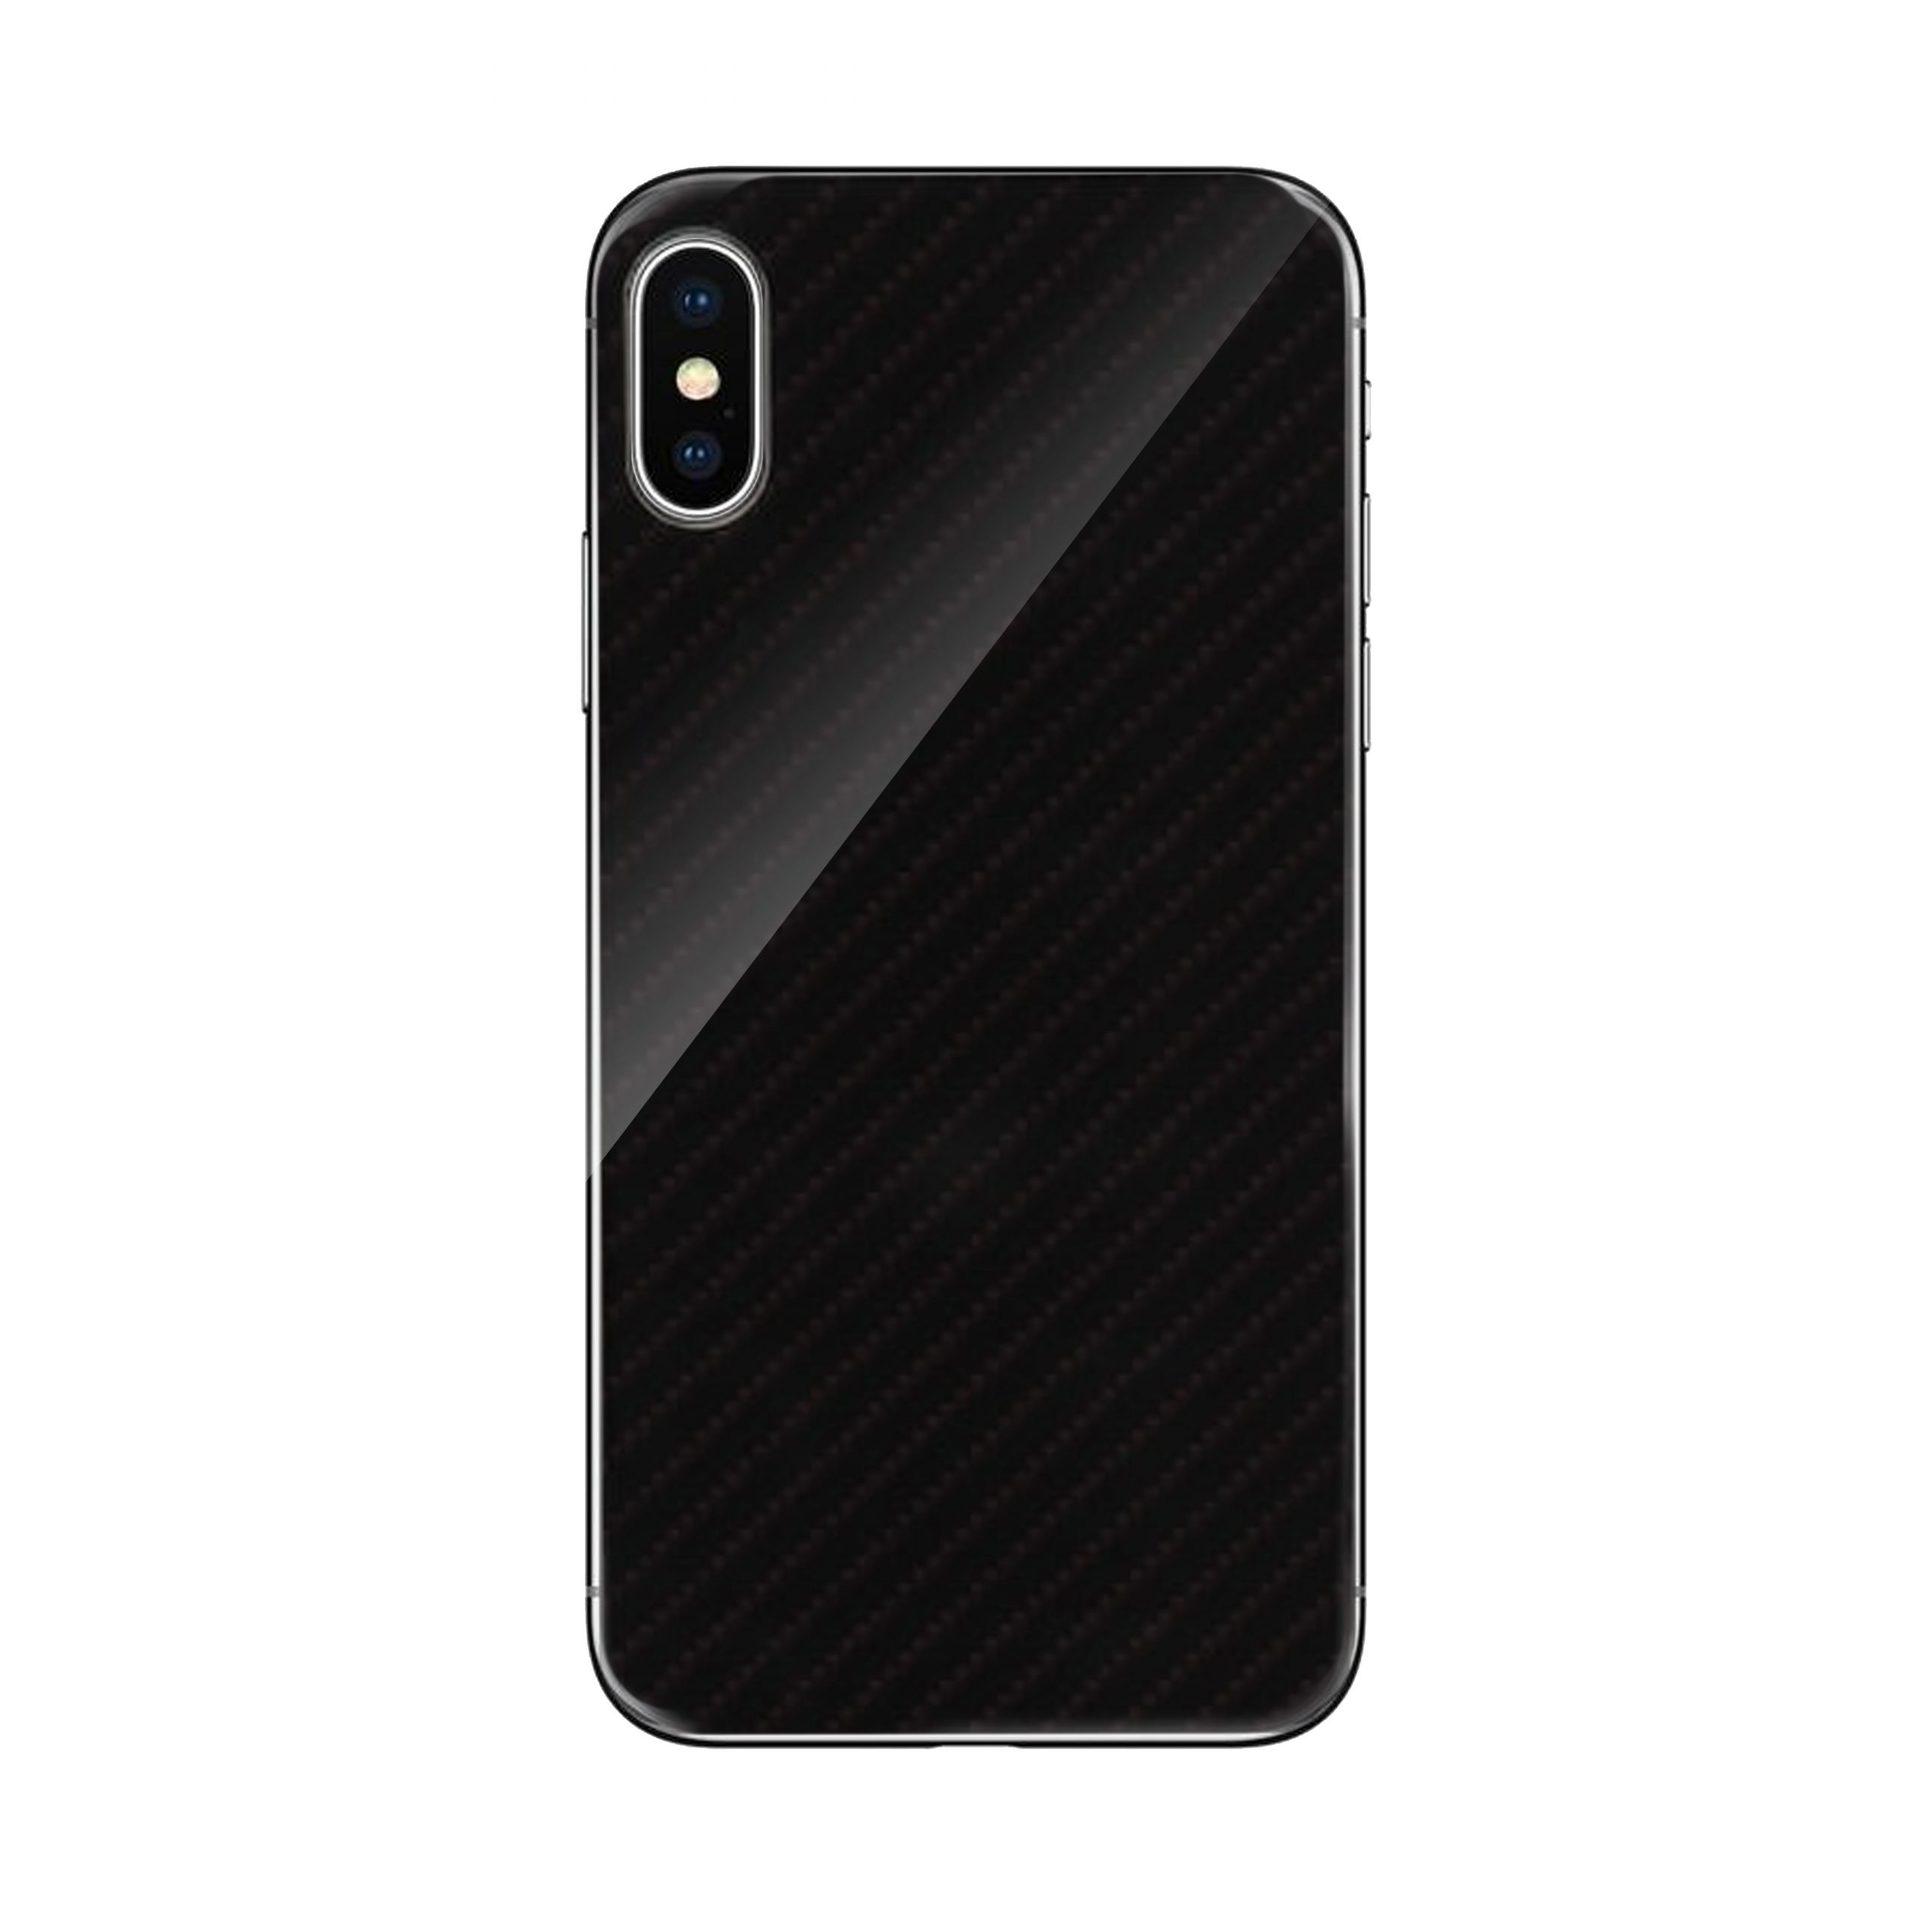 Etui Carbon Glass Case do Iphone X/XS Czarny